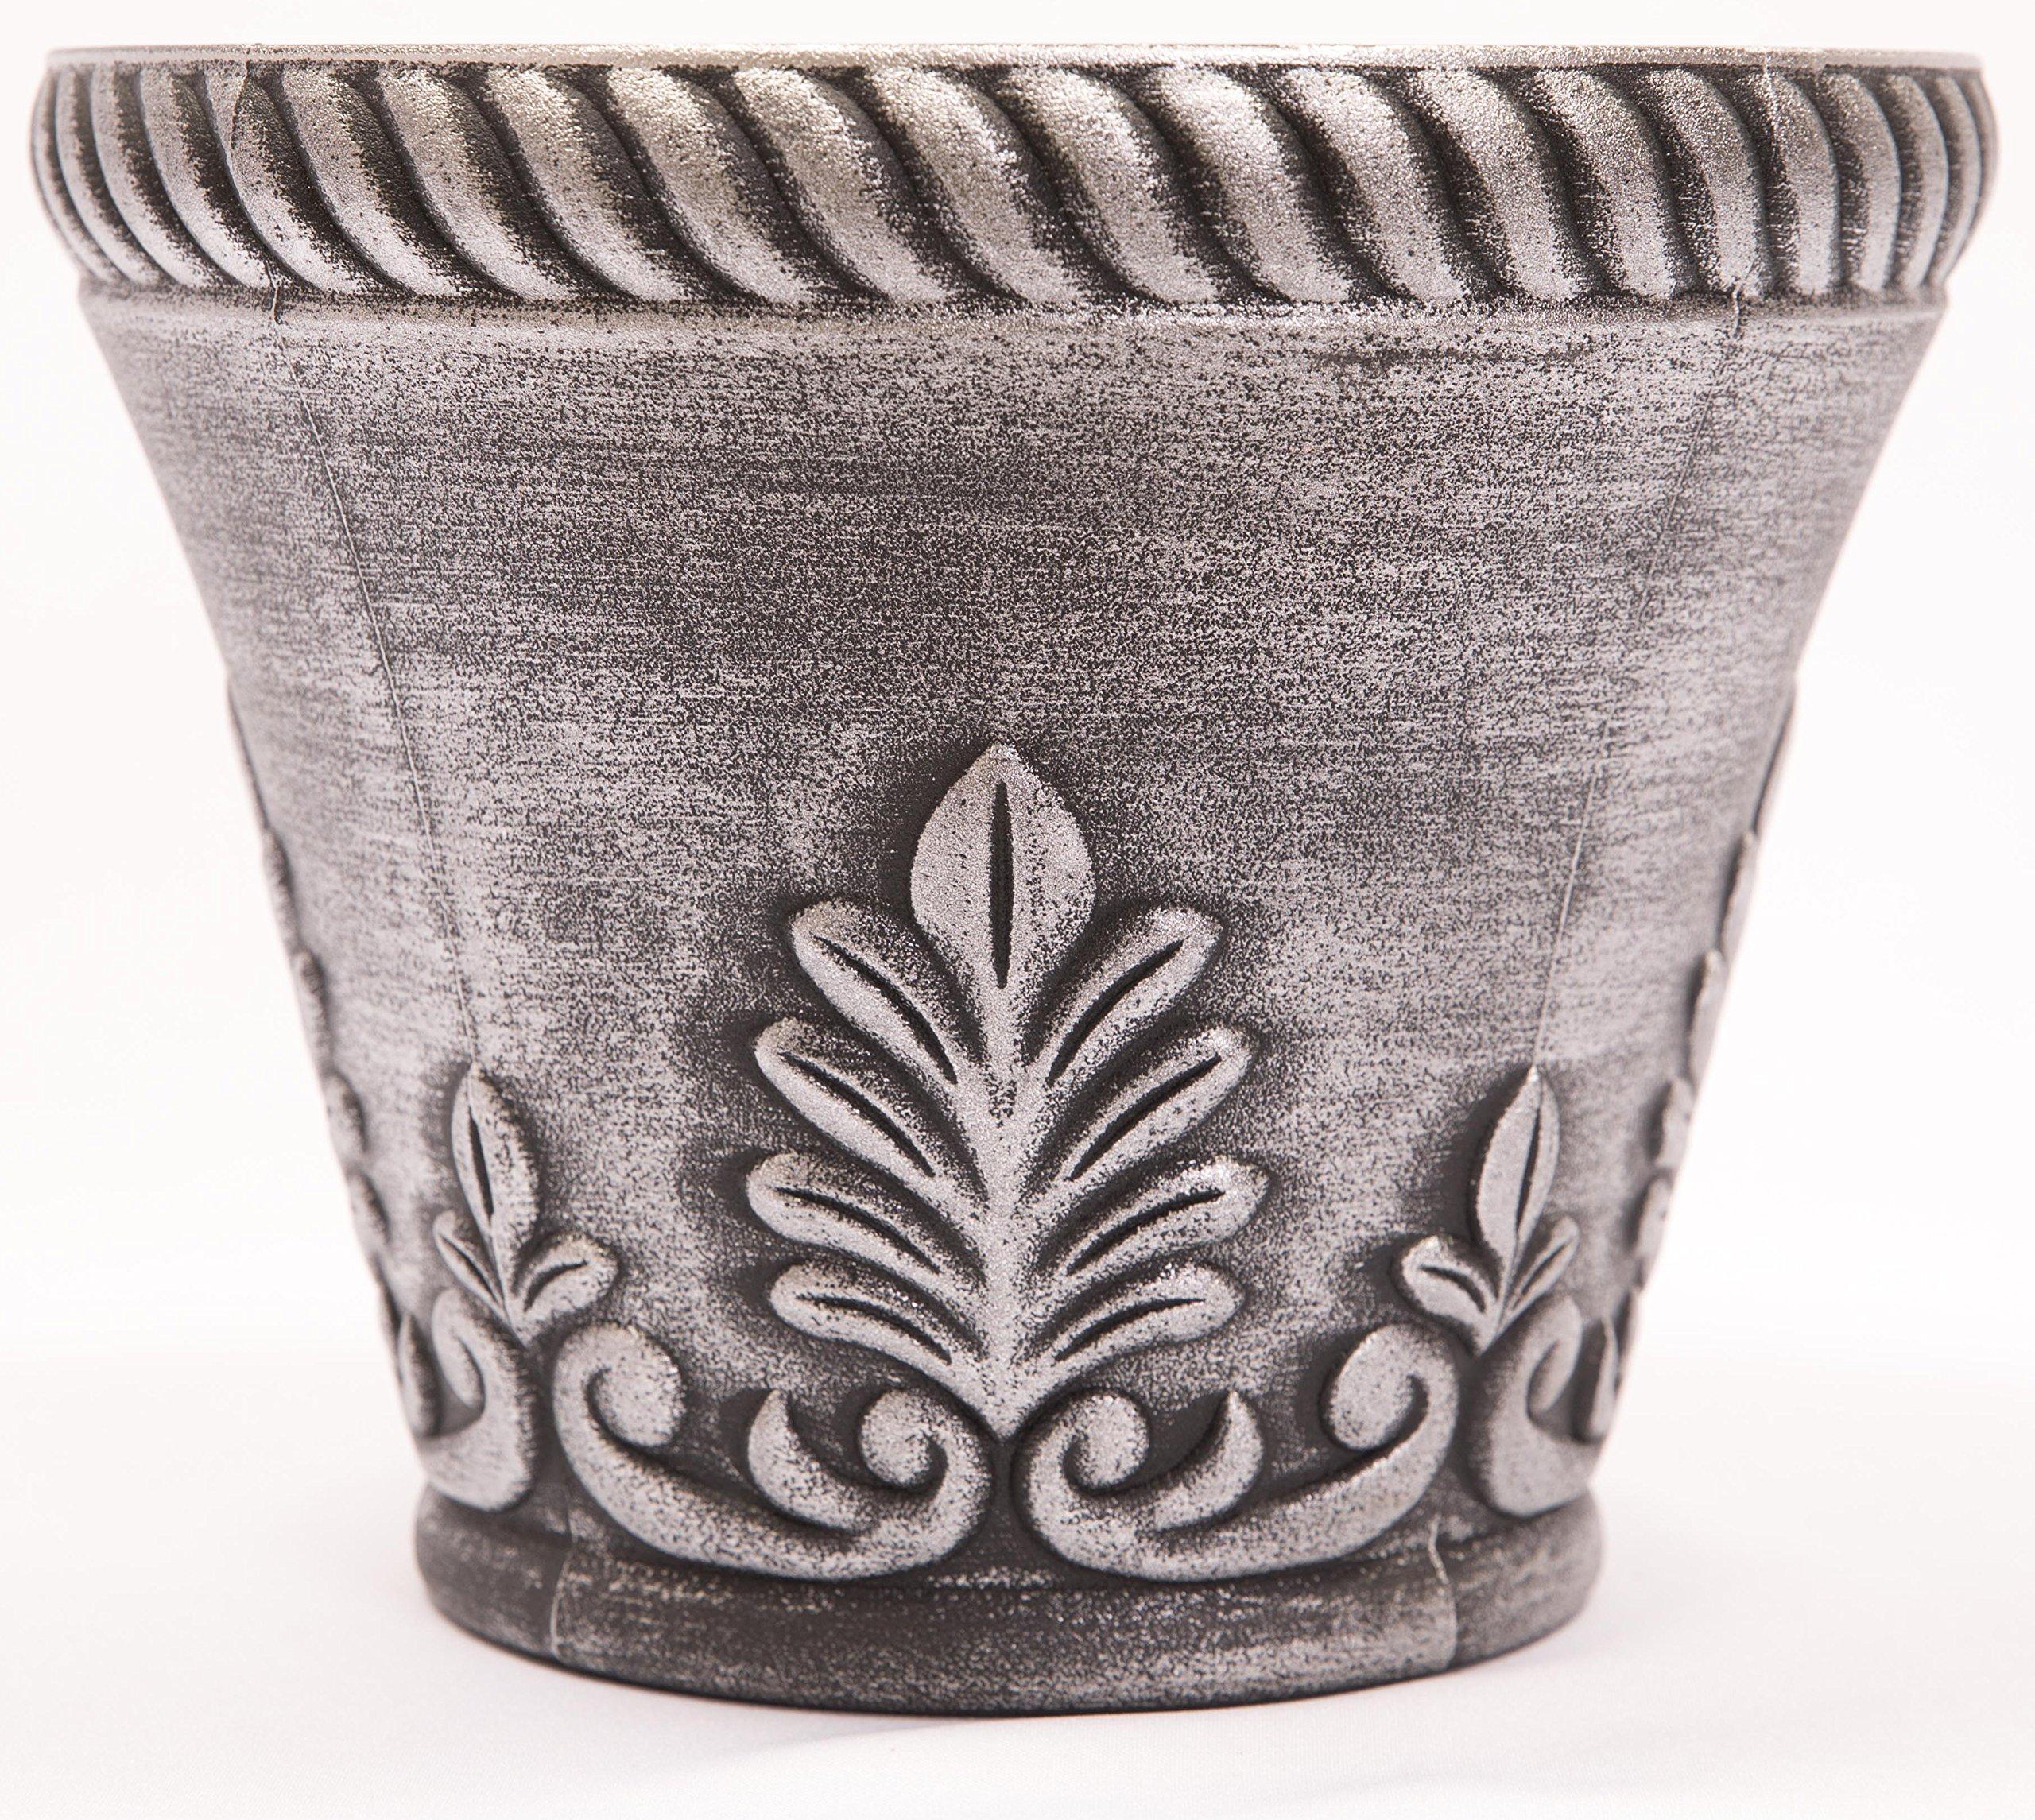 Corinthian Order Inspired Look Plastic Planter 10X8 Flowerpot for Indoor, Outdoor, Garden, Patio, Office Ornaments, Home Decor, Long Lasting Reusable, Light Weight, Water Resistant (Copper-CO1)